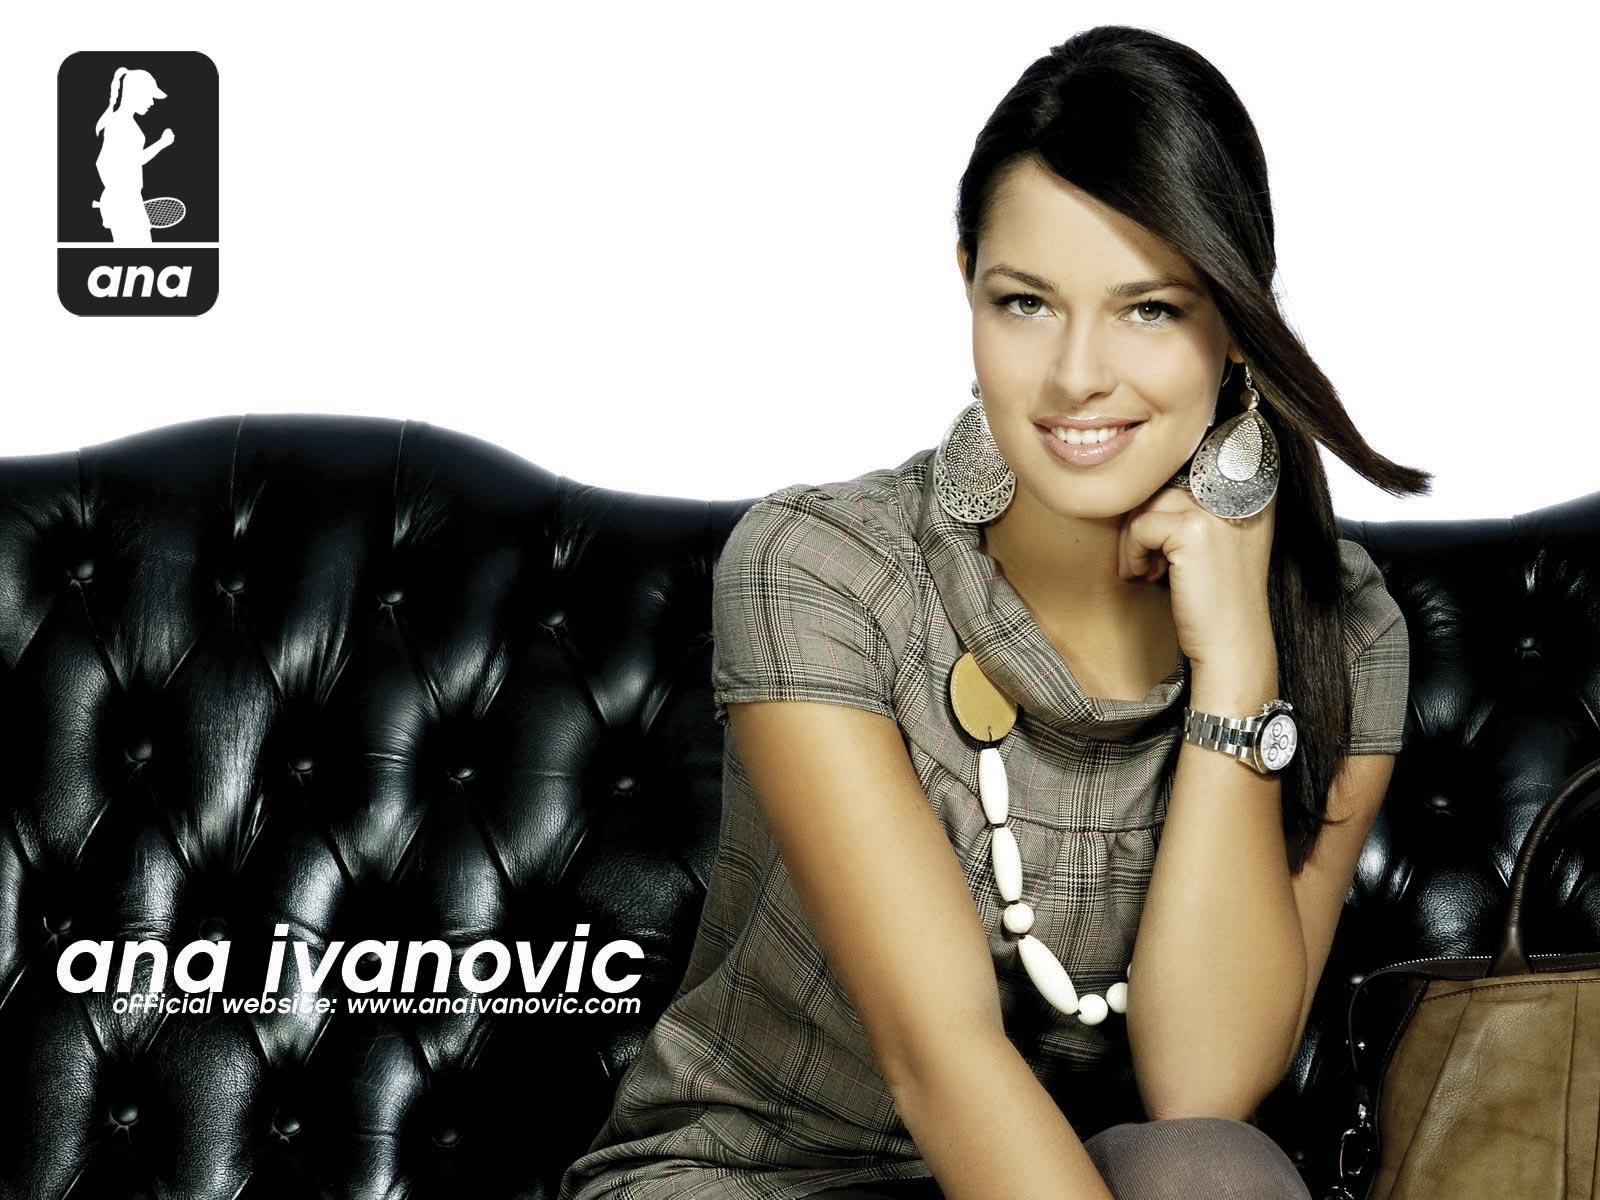 Ana Ivanovic Wallpaper 1600x1200